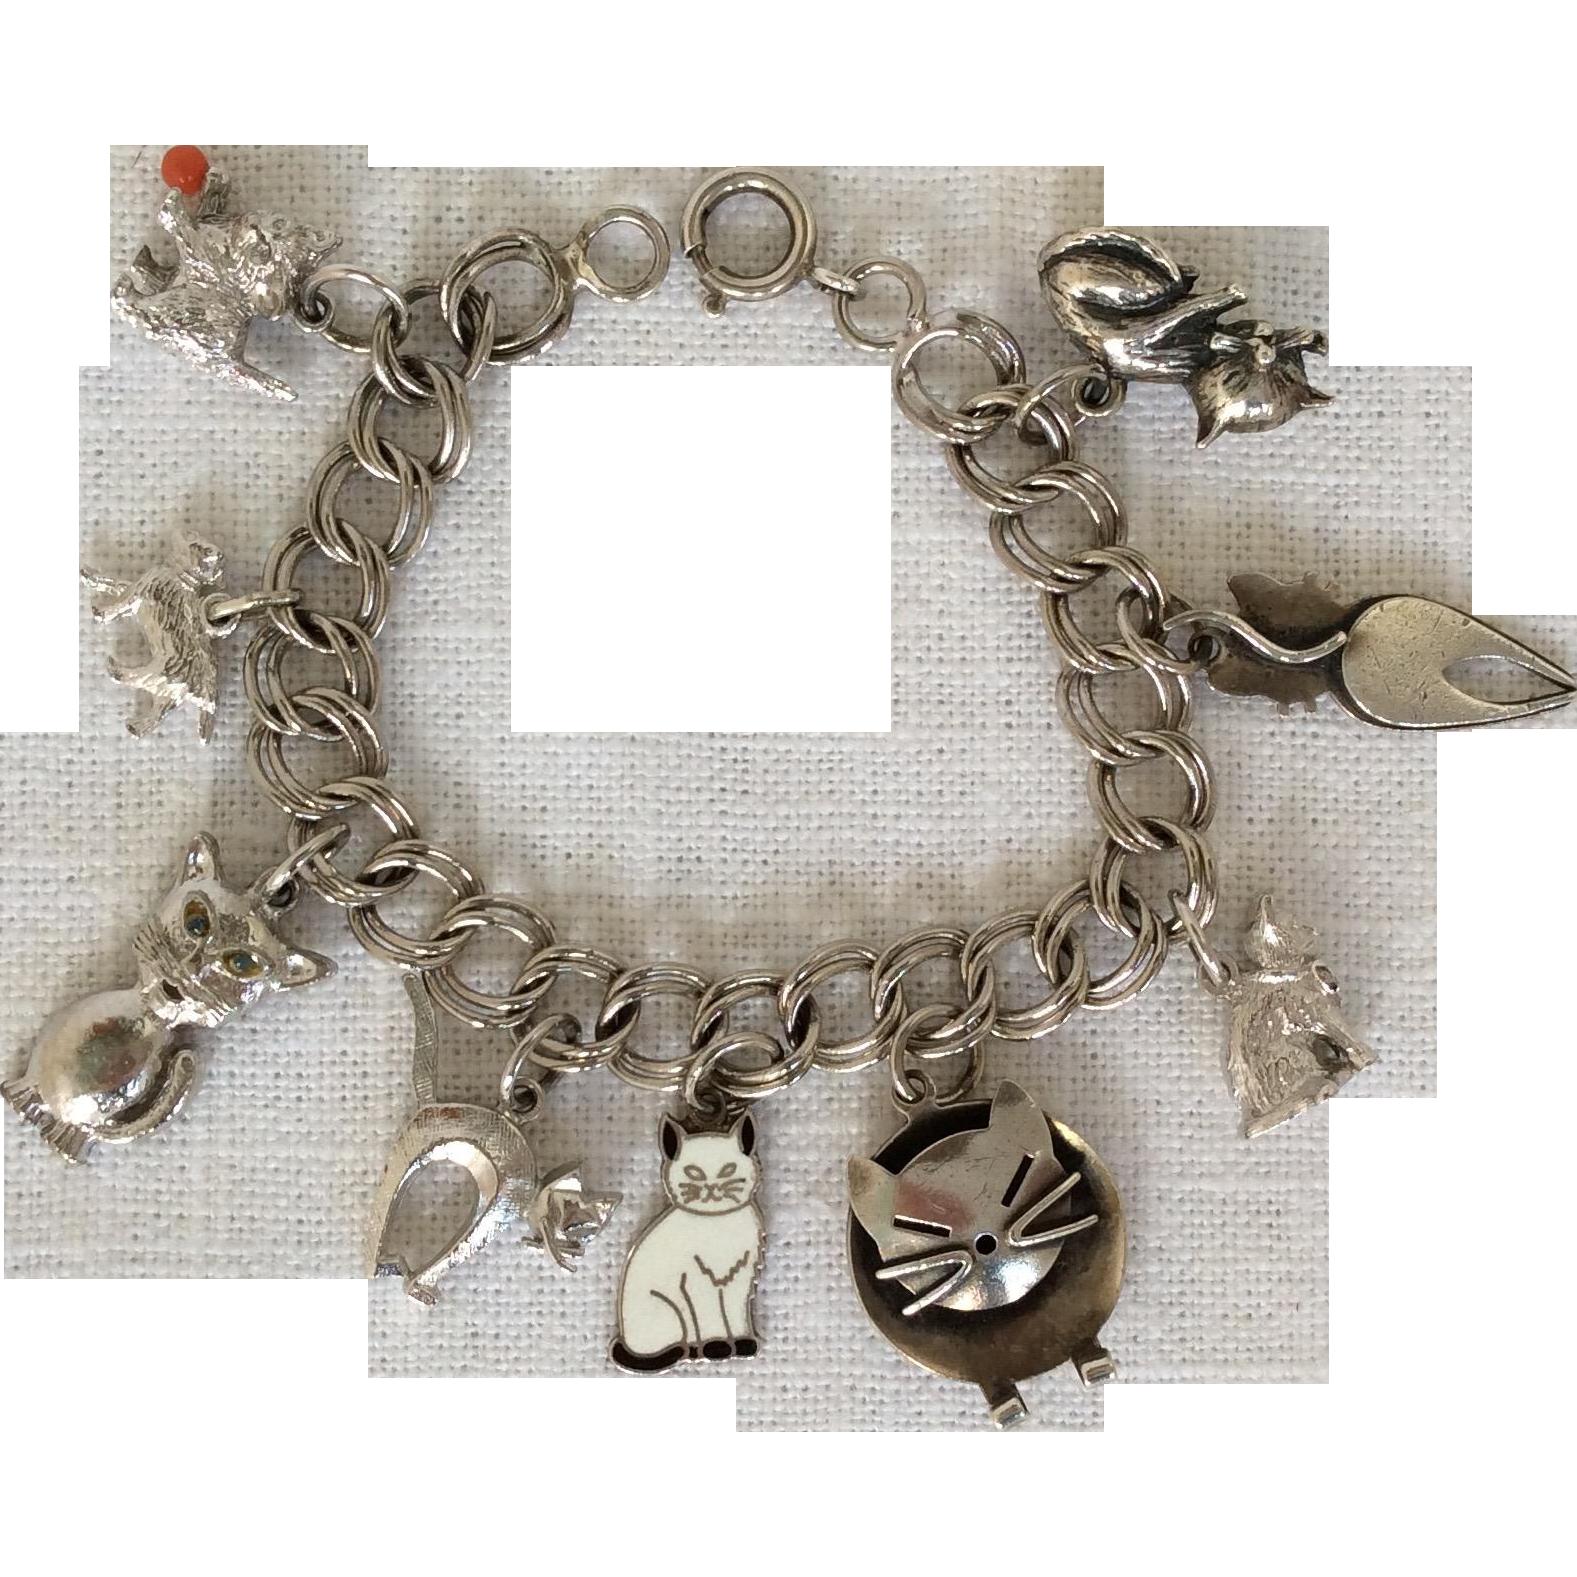 Vintage sterling silver cat charm bracelet from caldwells on Ruby Lane